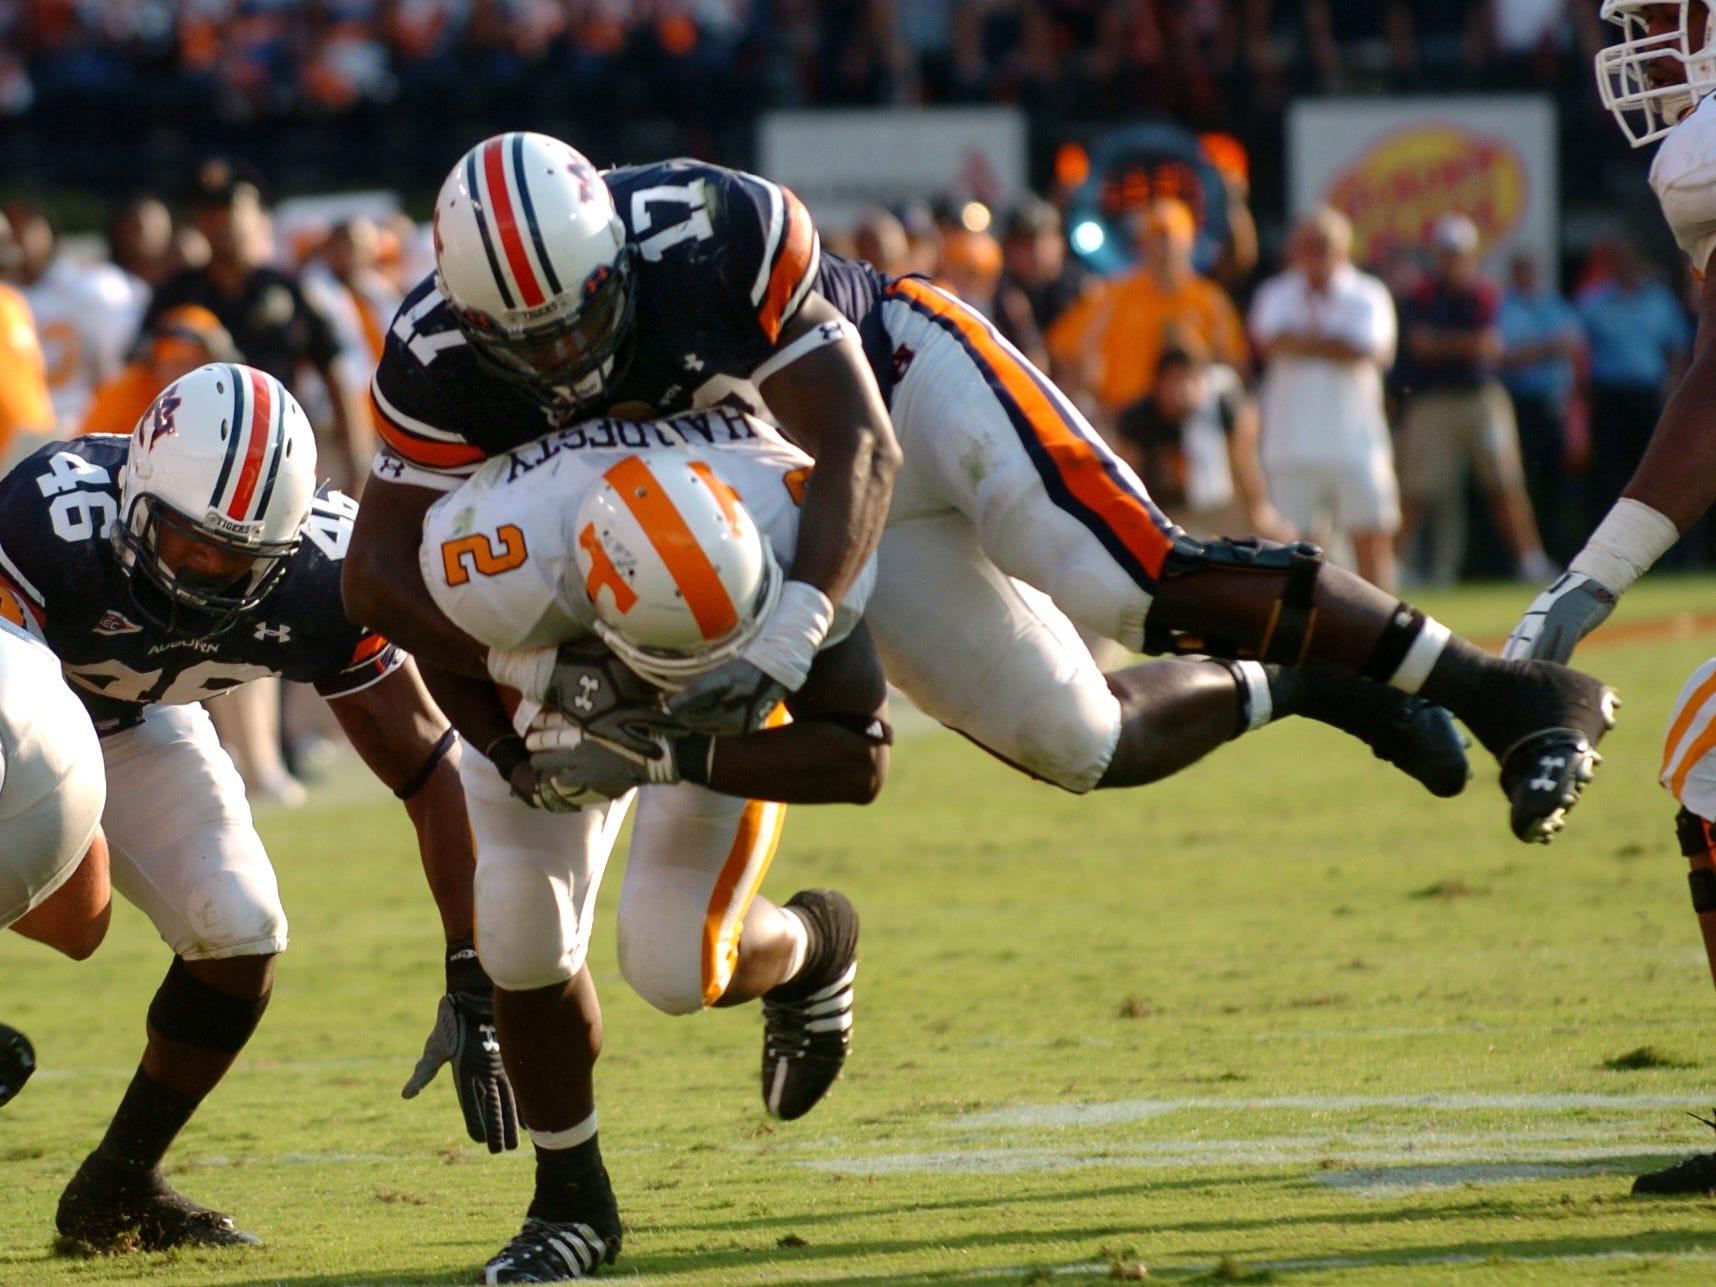 Tennessee running back Montario Hardesty (2) is tackled by Auburn linebacker Joshua Bynes (17) Saturday at Jordan-Hare Stadium in Alabama in 2008. Auburn won 14-12, dropping the Vols' season record to 1-3.